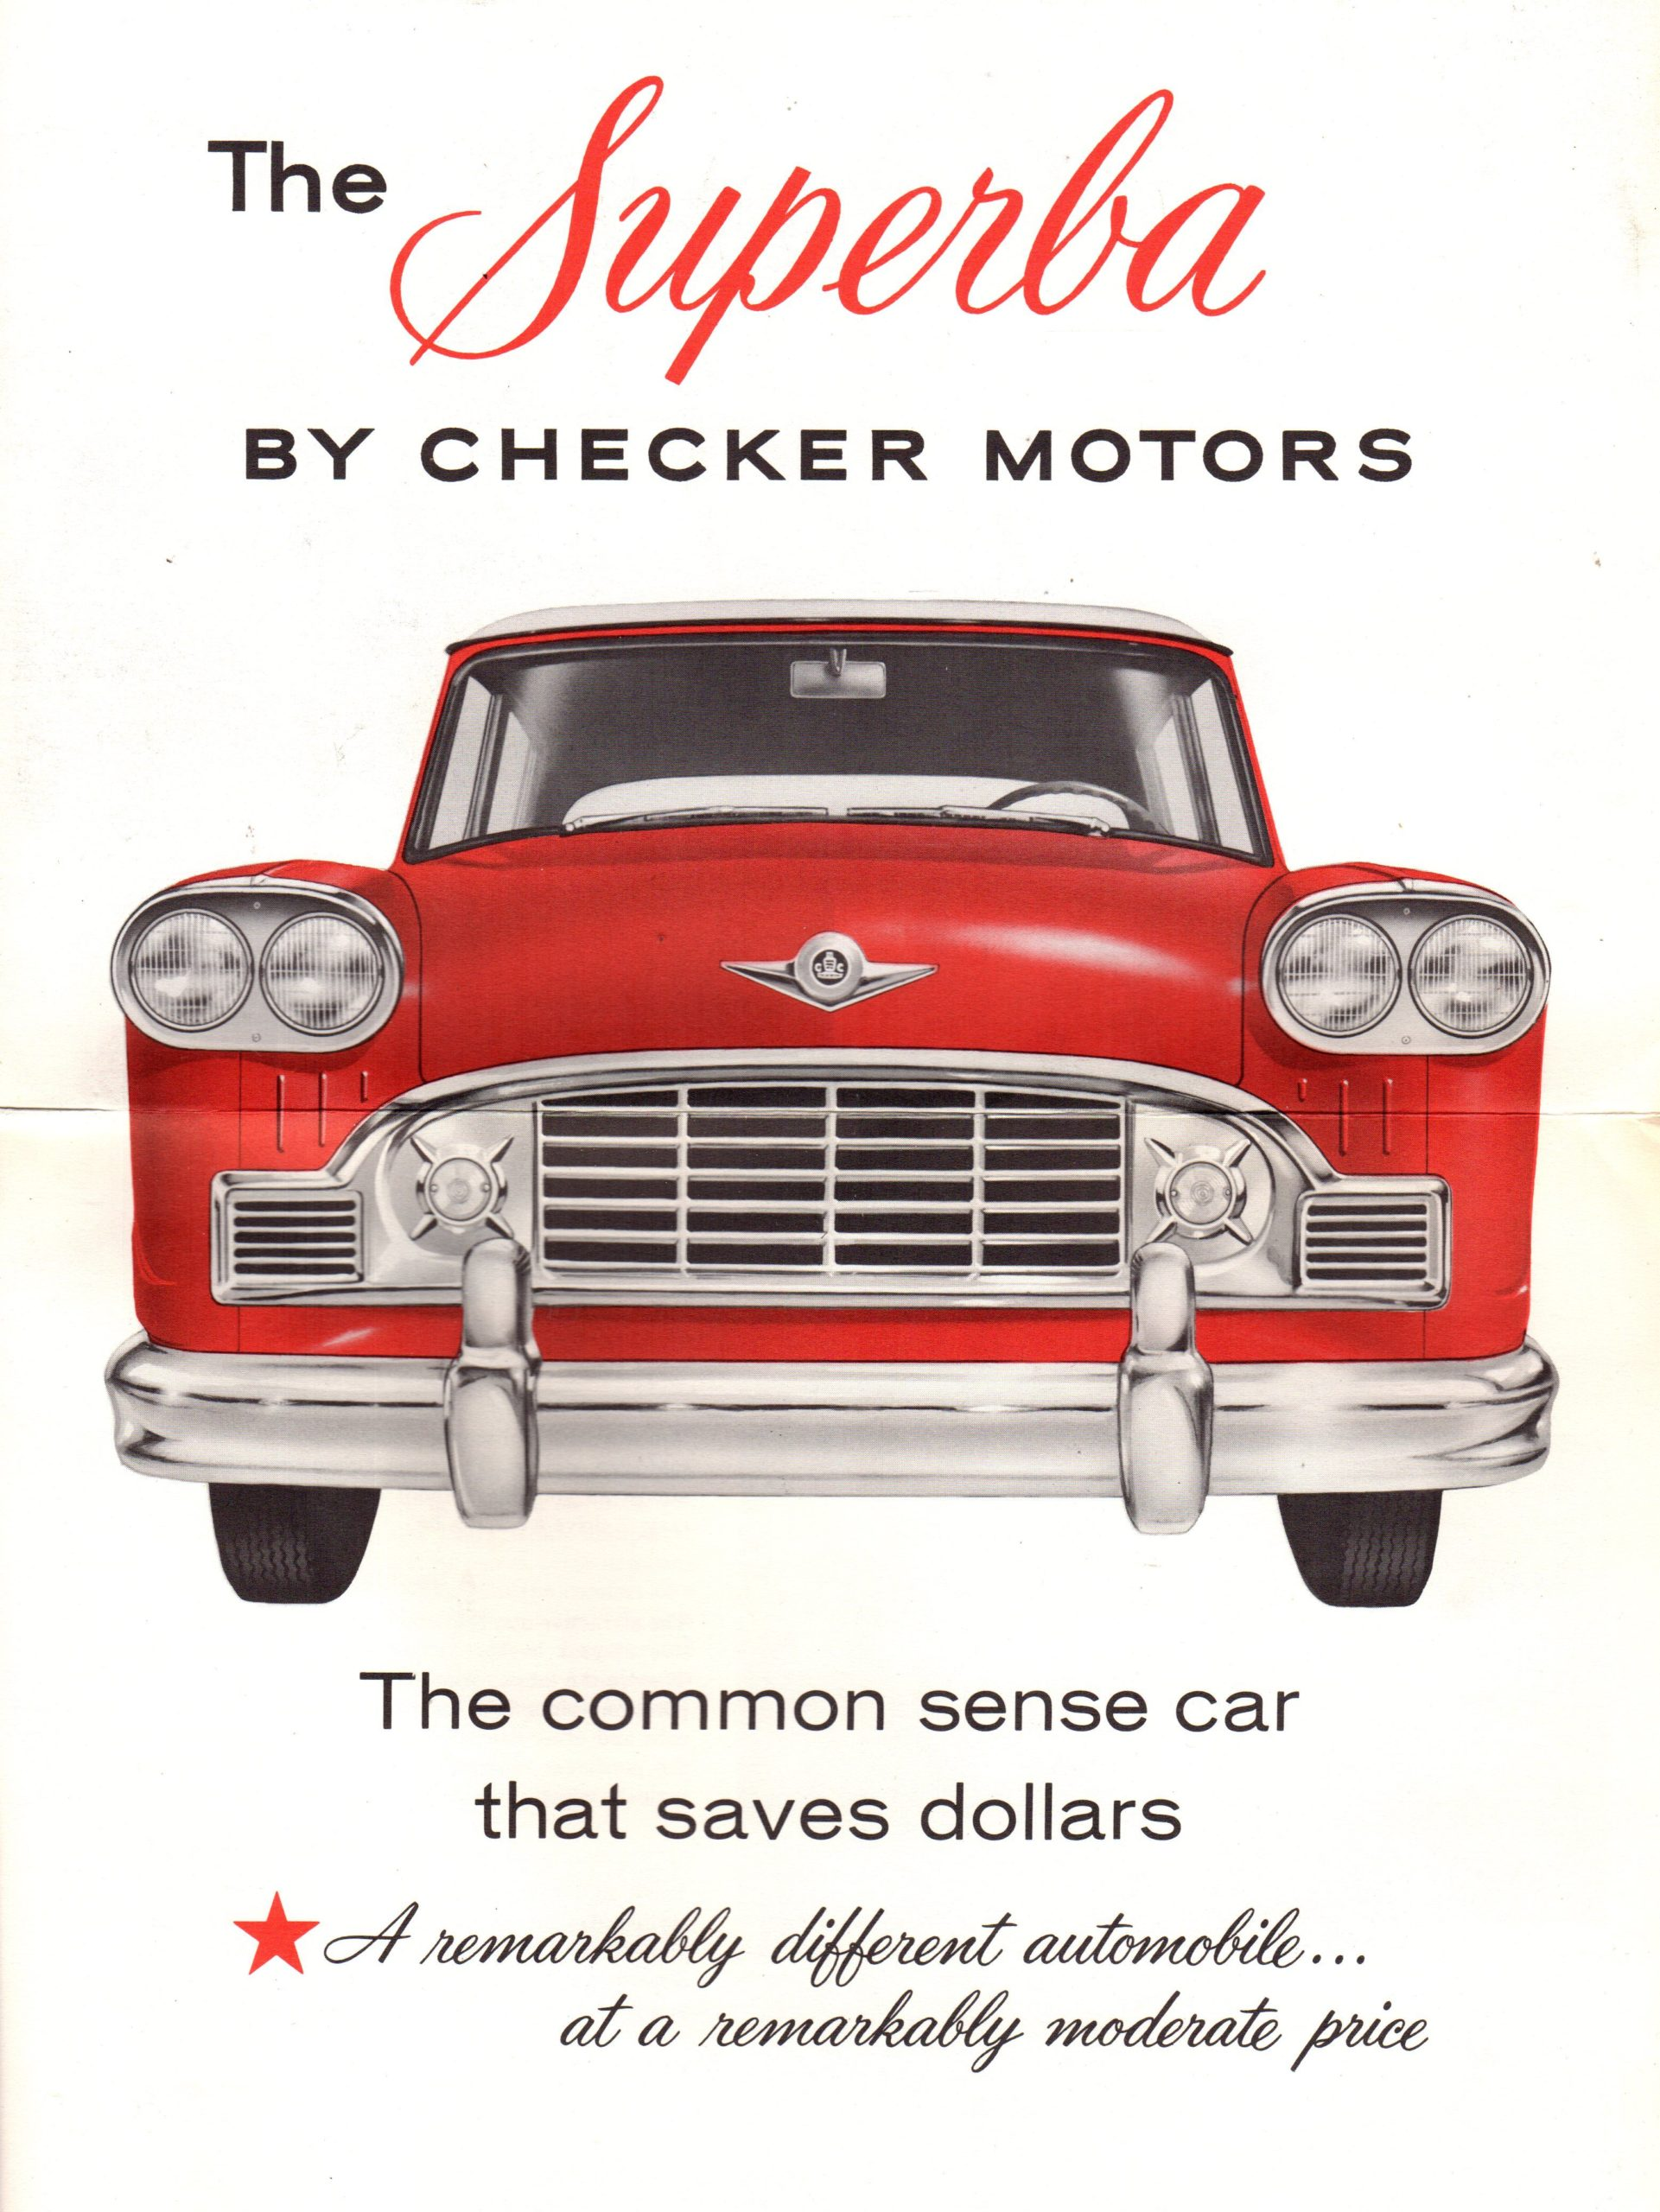 1960 Checker Brochure